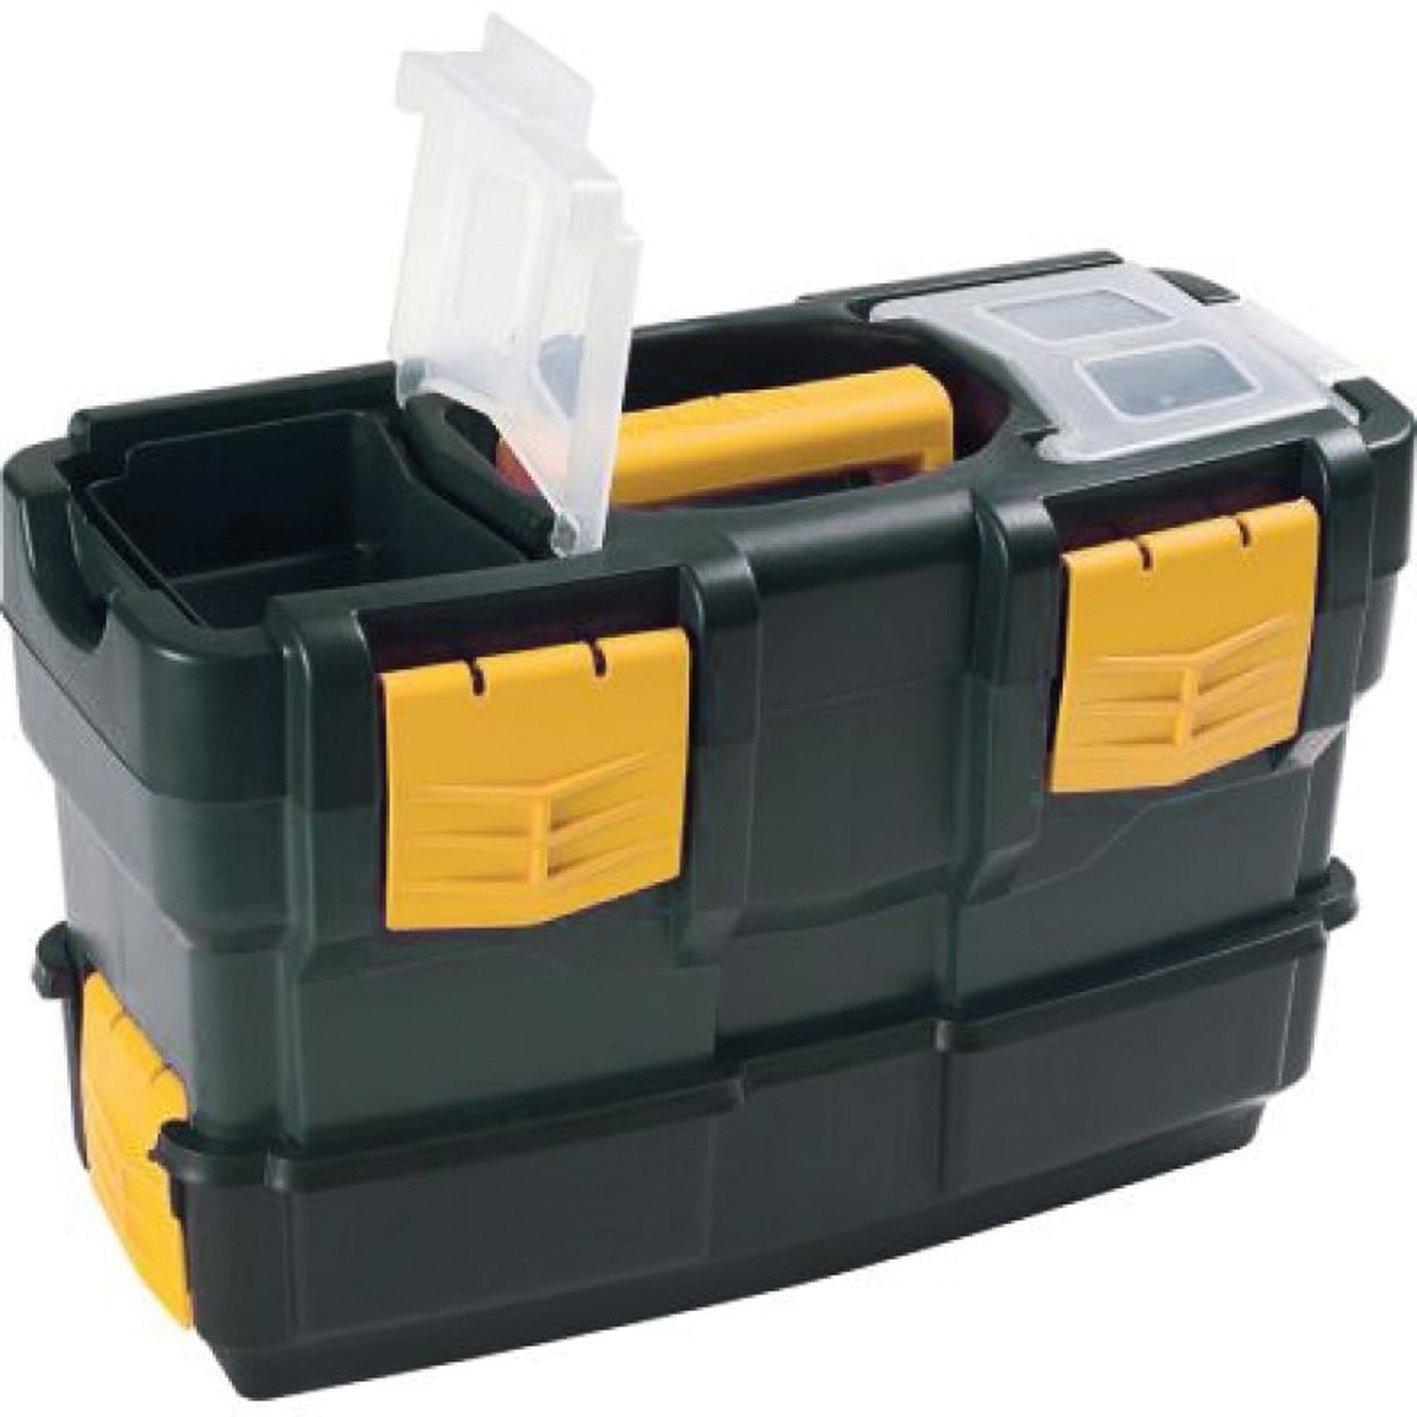 Art Plast 6300V De plástico, Polipropileno Negro, Amarillo caja de ...